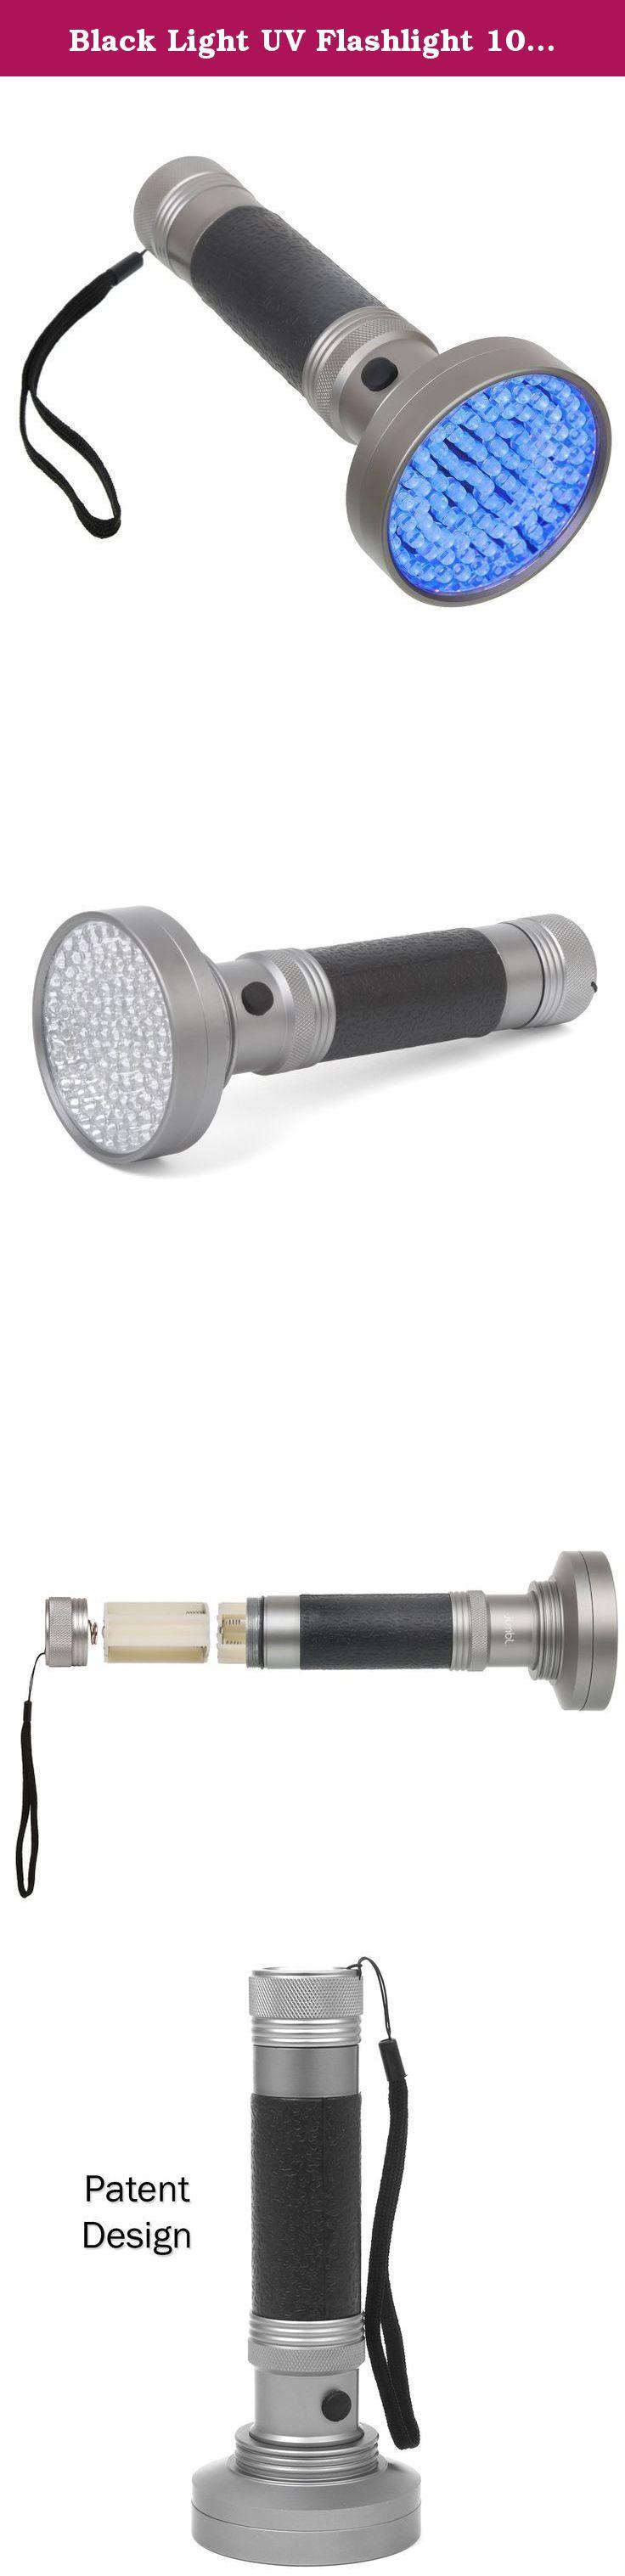 Black Light UV Flashlight 100 LED Blacklight Premium